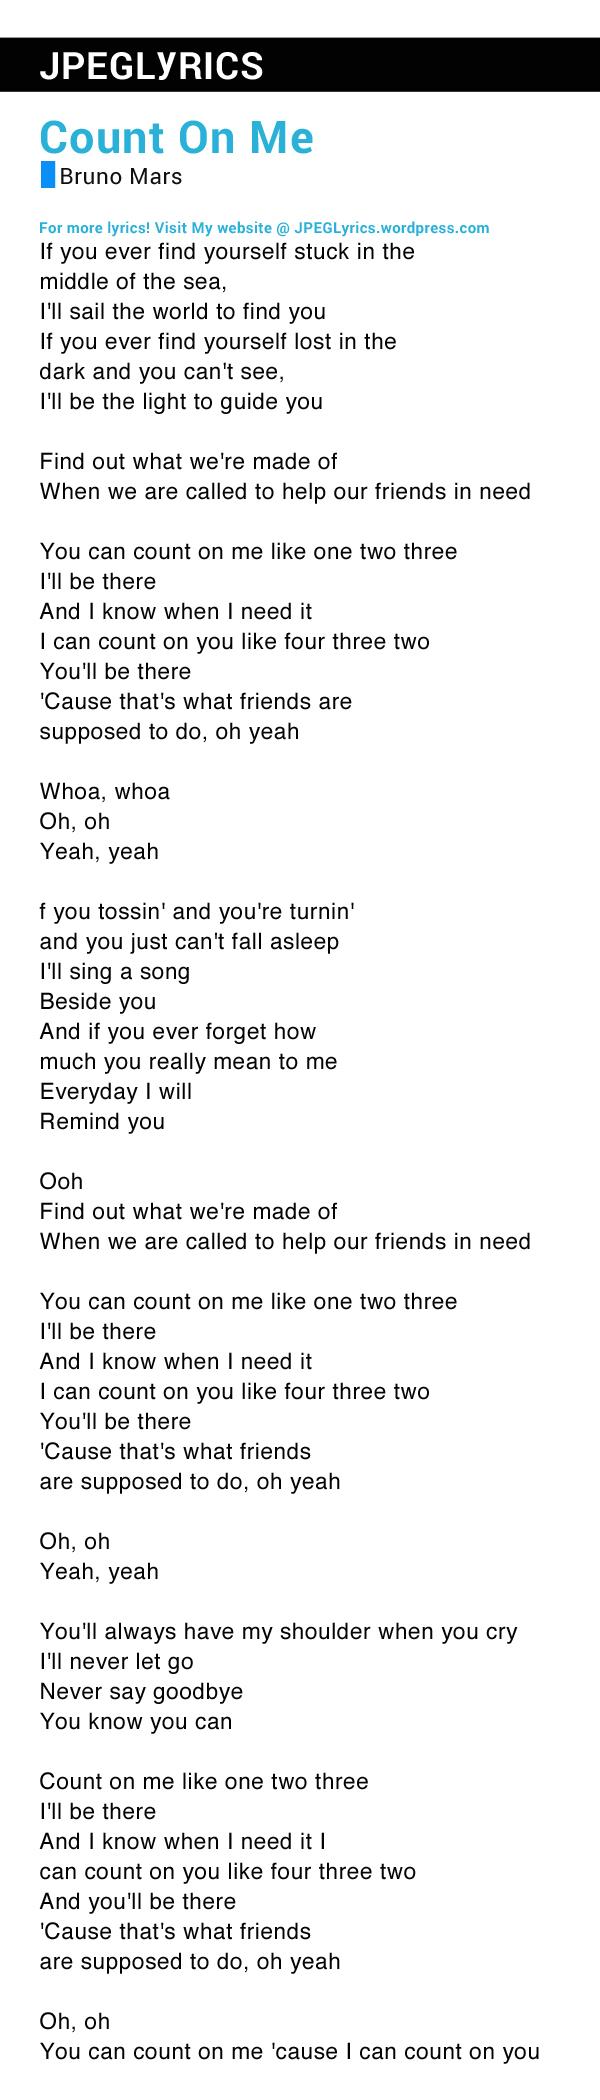 Finesse mars lyrics bruno